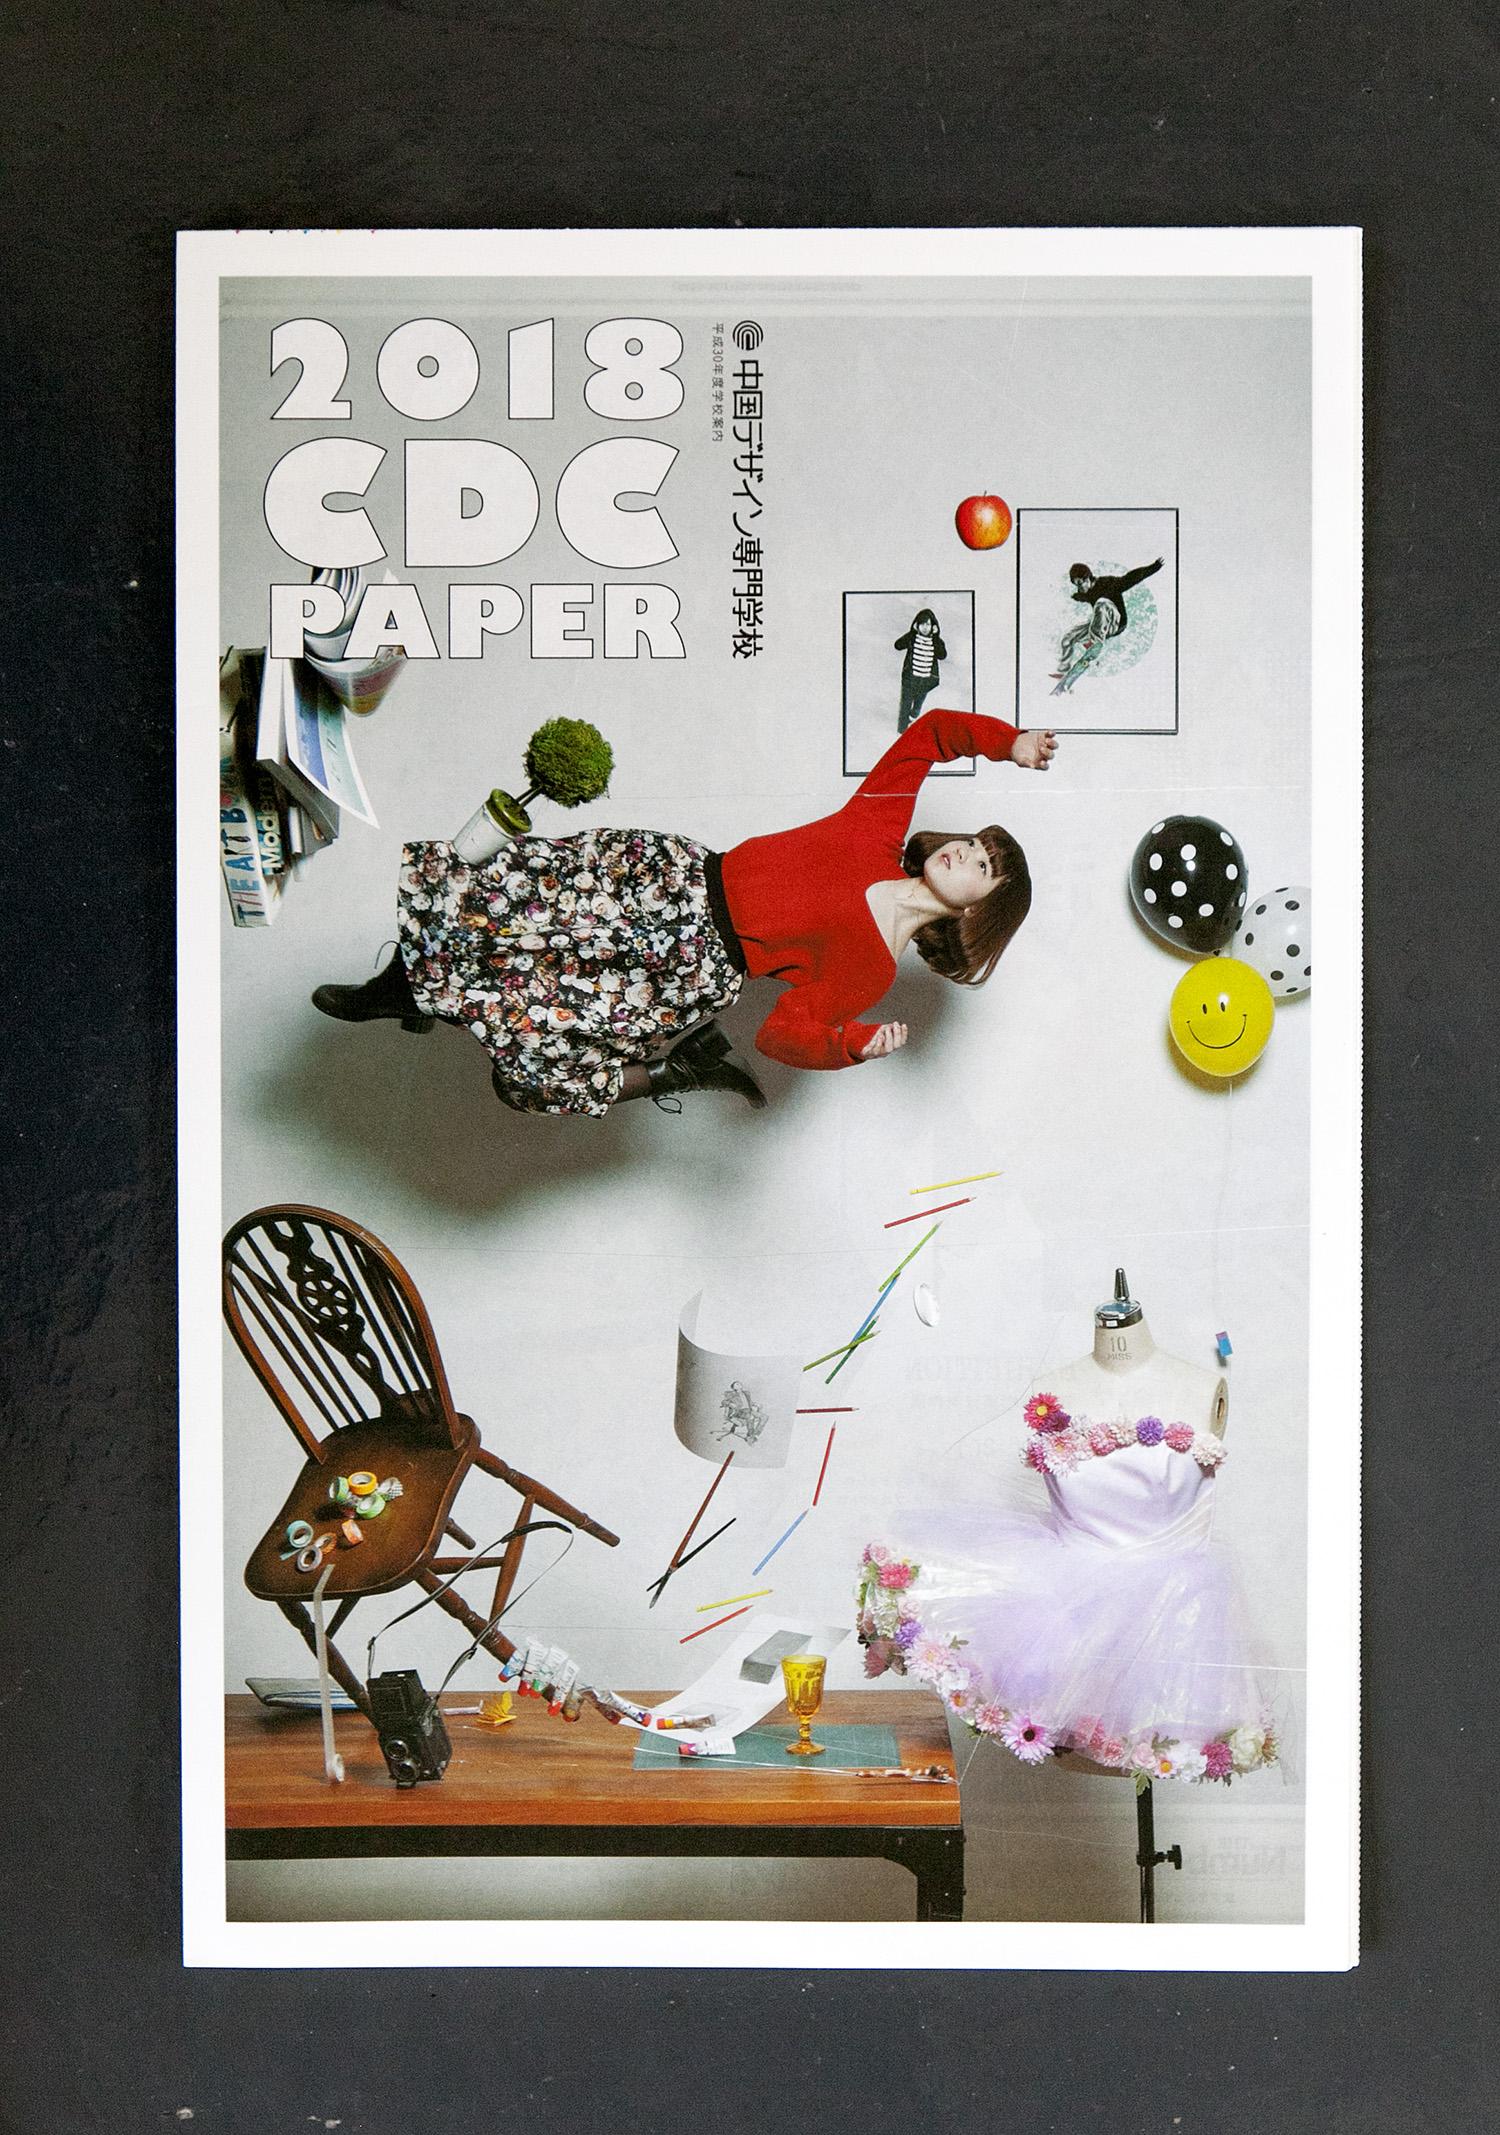 cdec2017_03